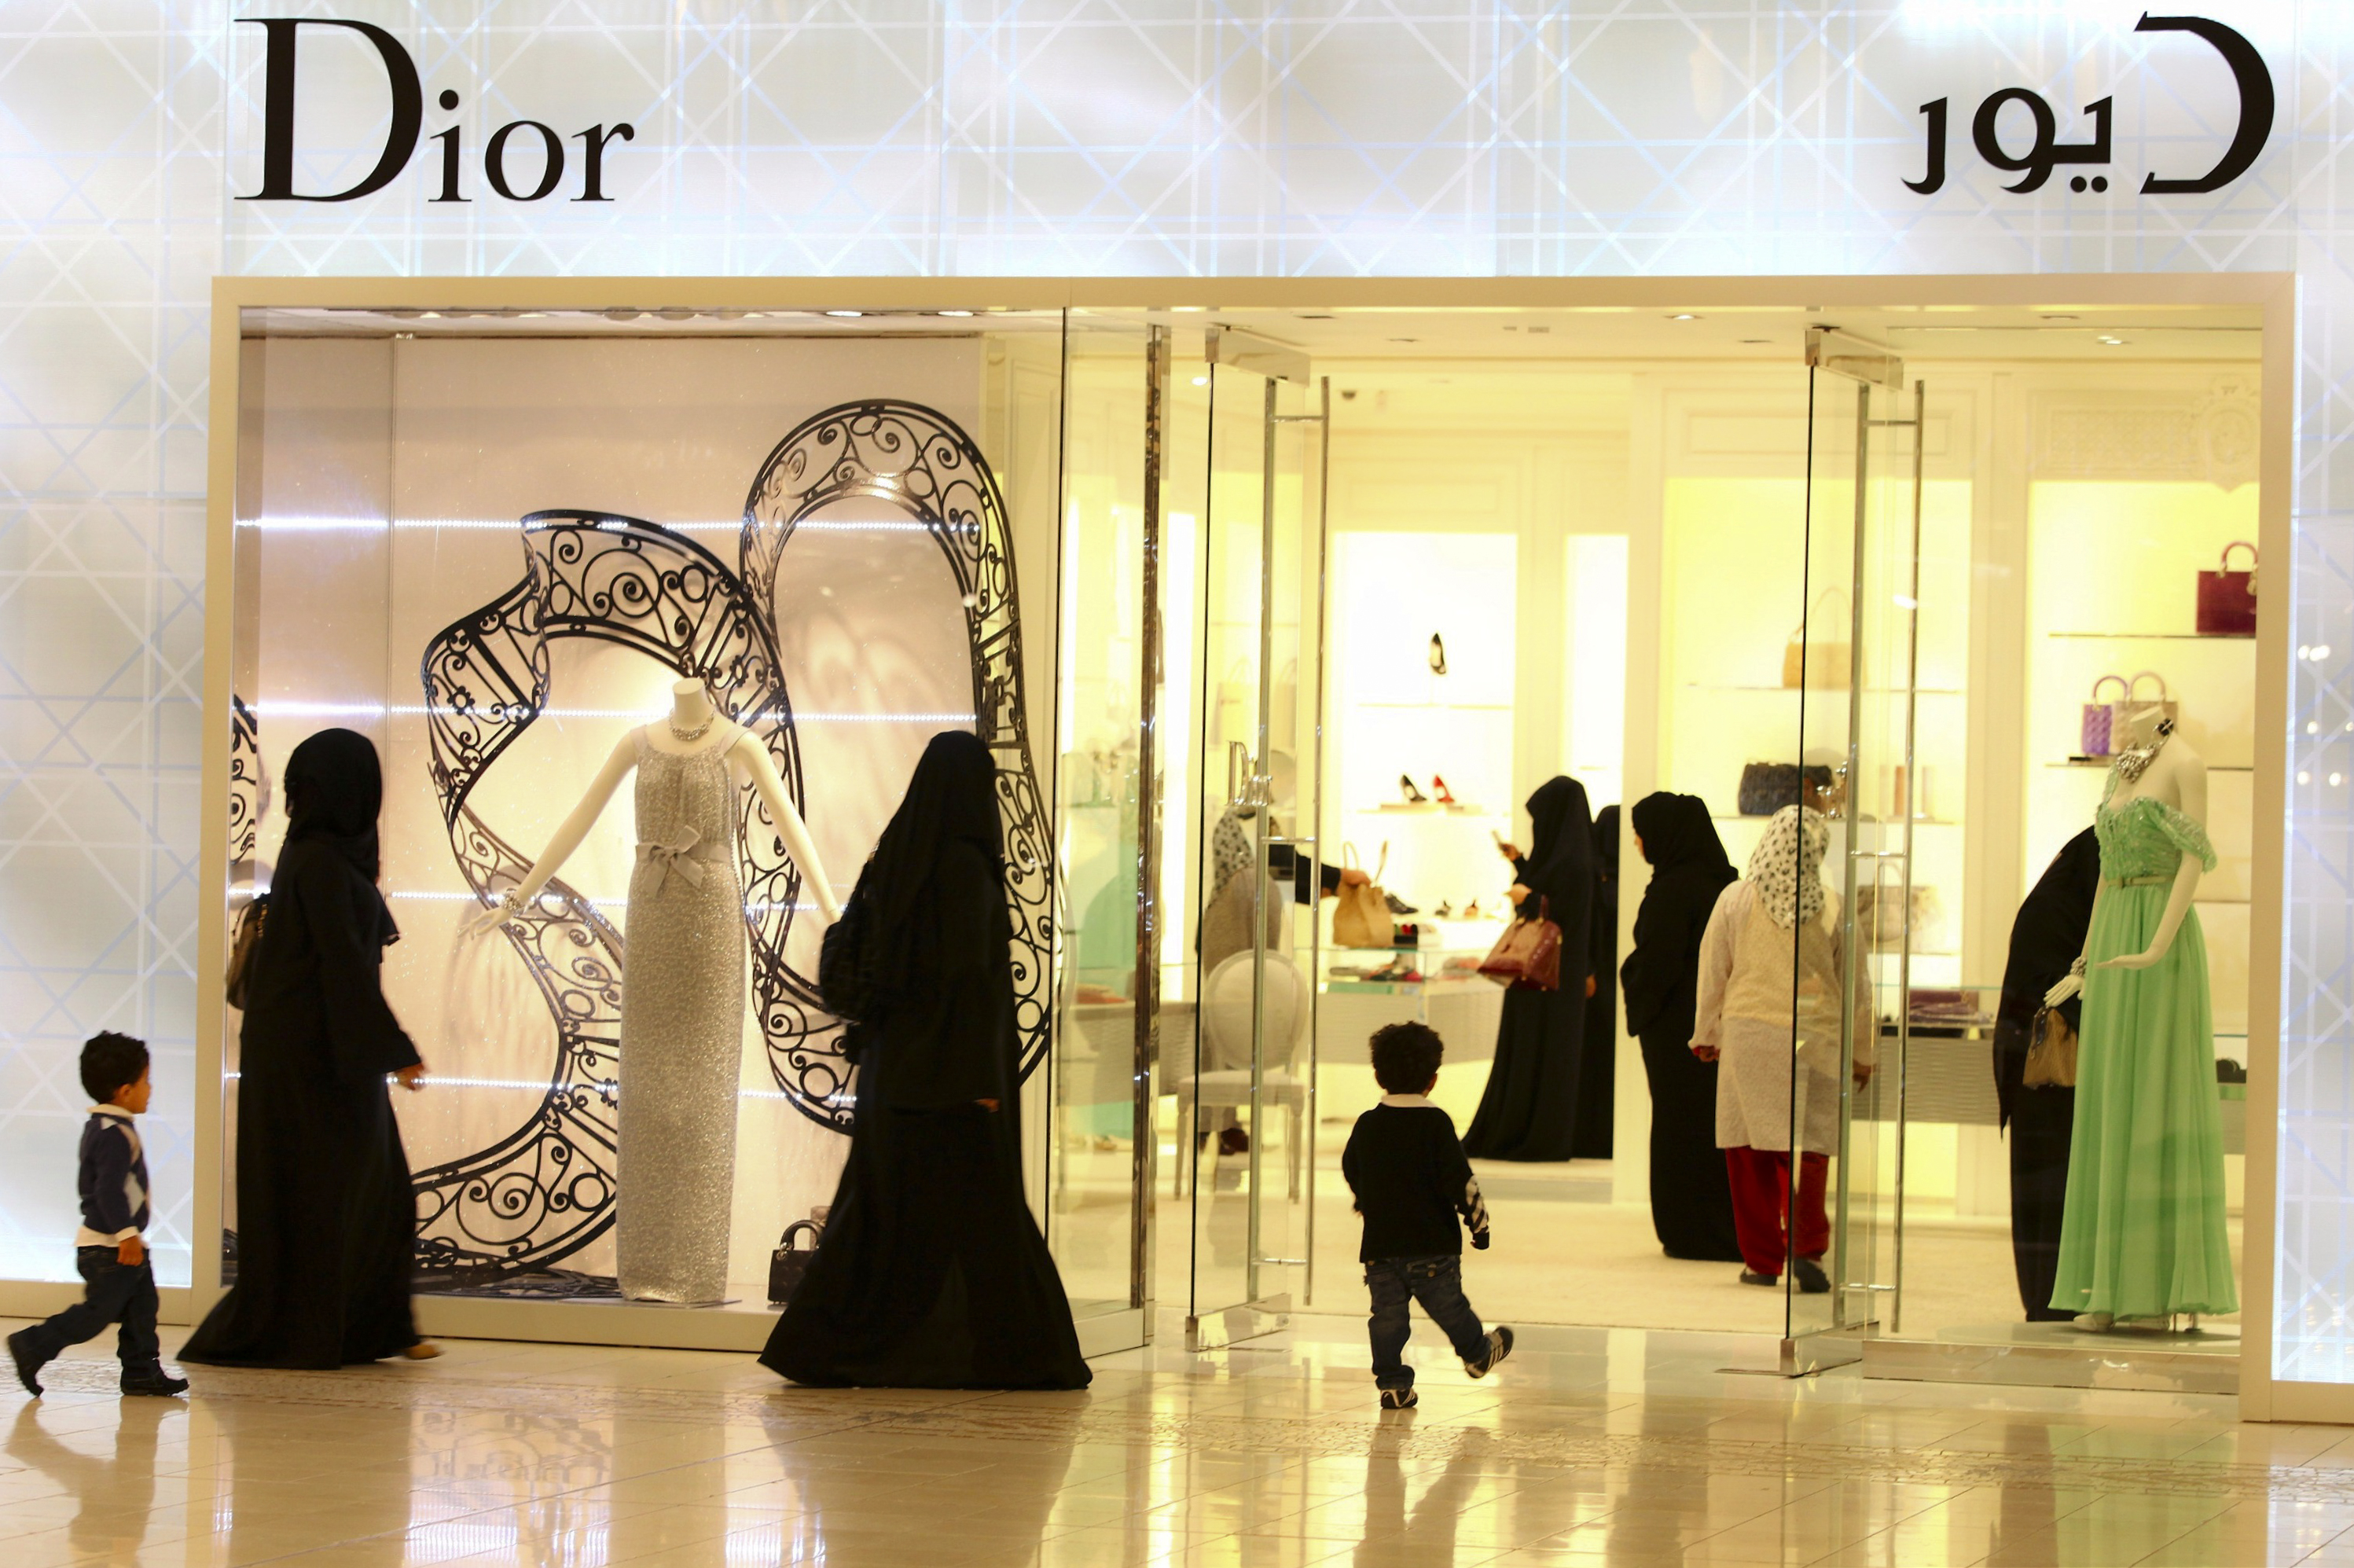 Qatari Residents Shopping At The Villagio Mall In Doha